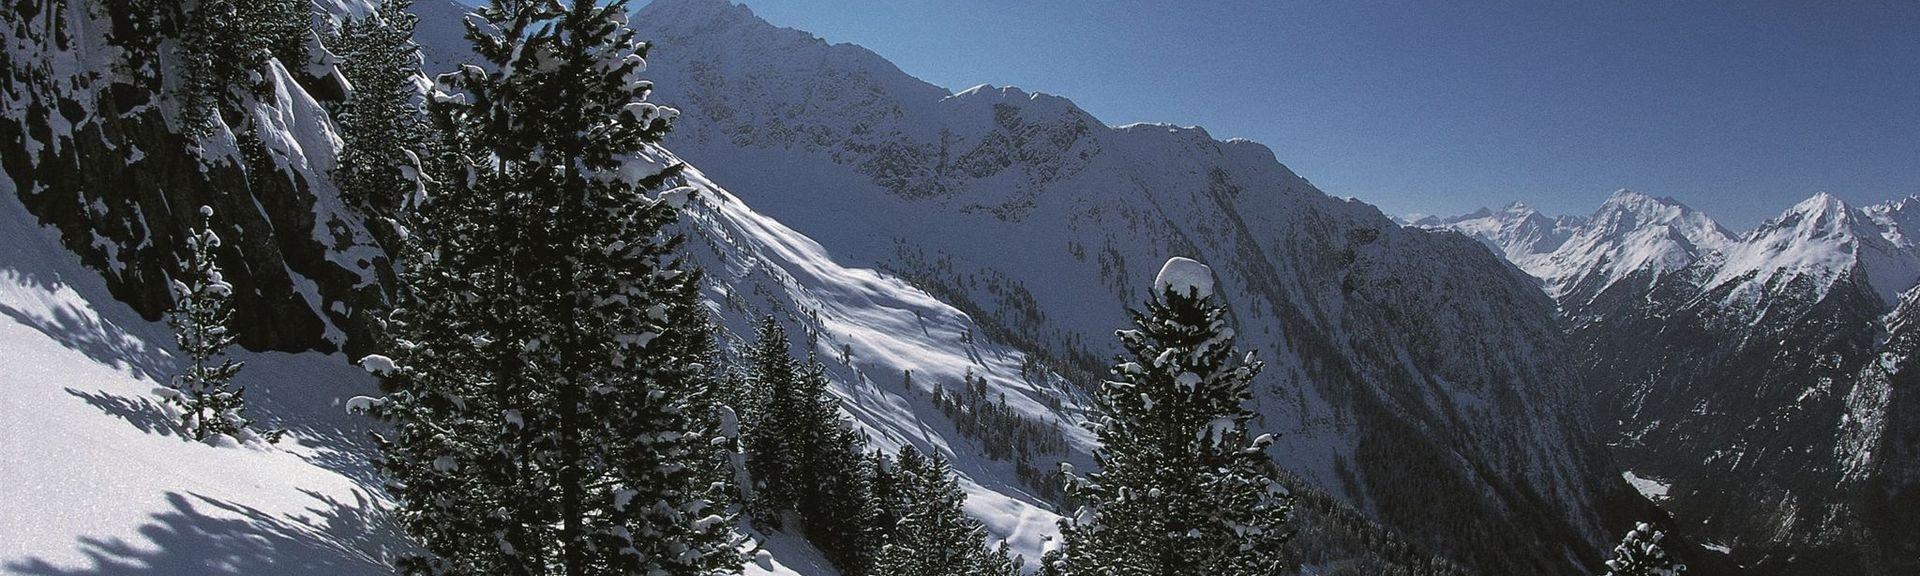 Alpbach, Tyrol, Austria